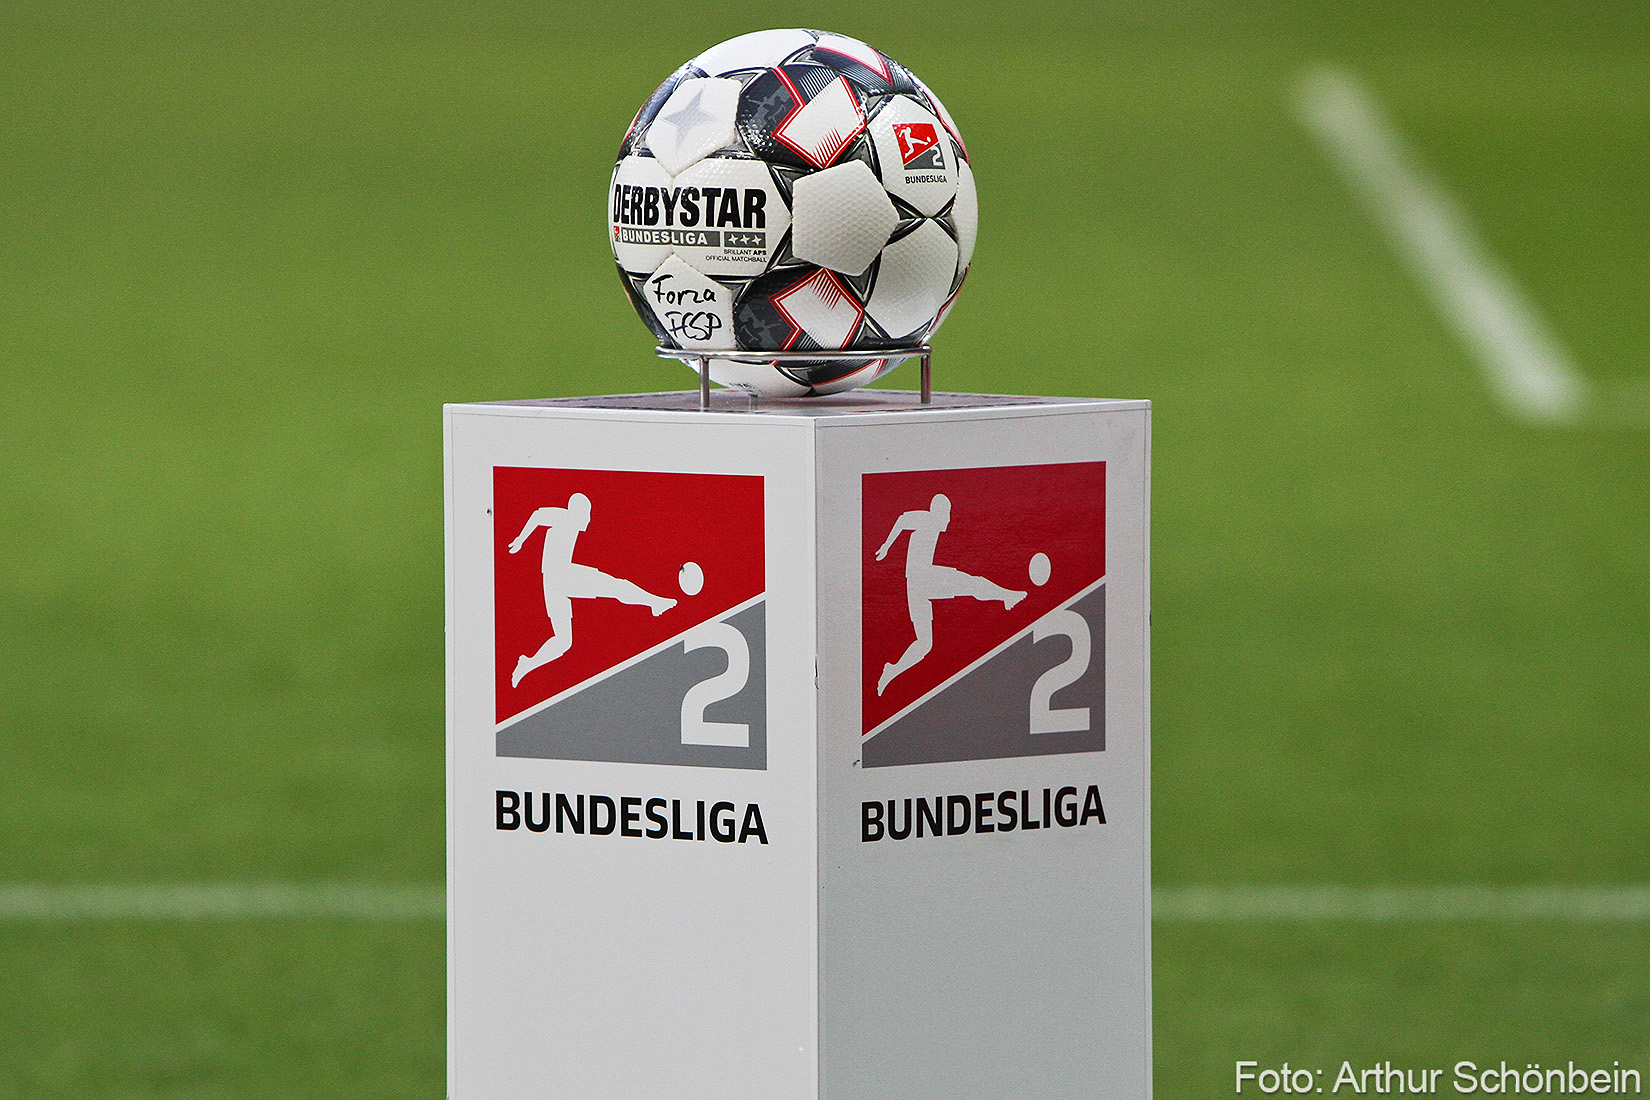 Karlsruher SC – SV Darmstadt 98 2:0 (0:0)